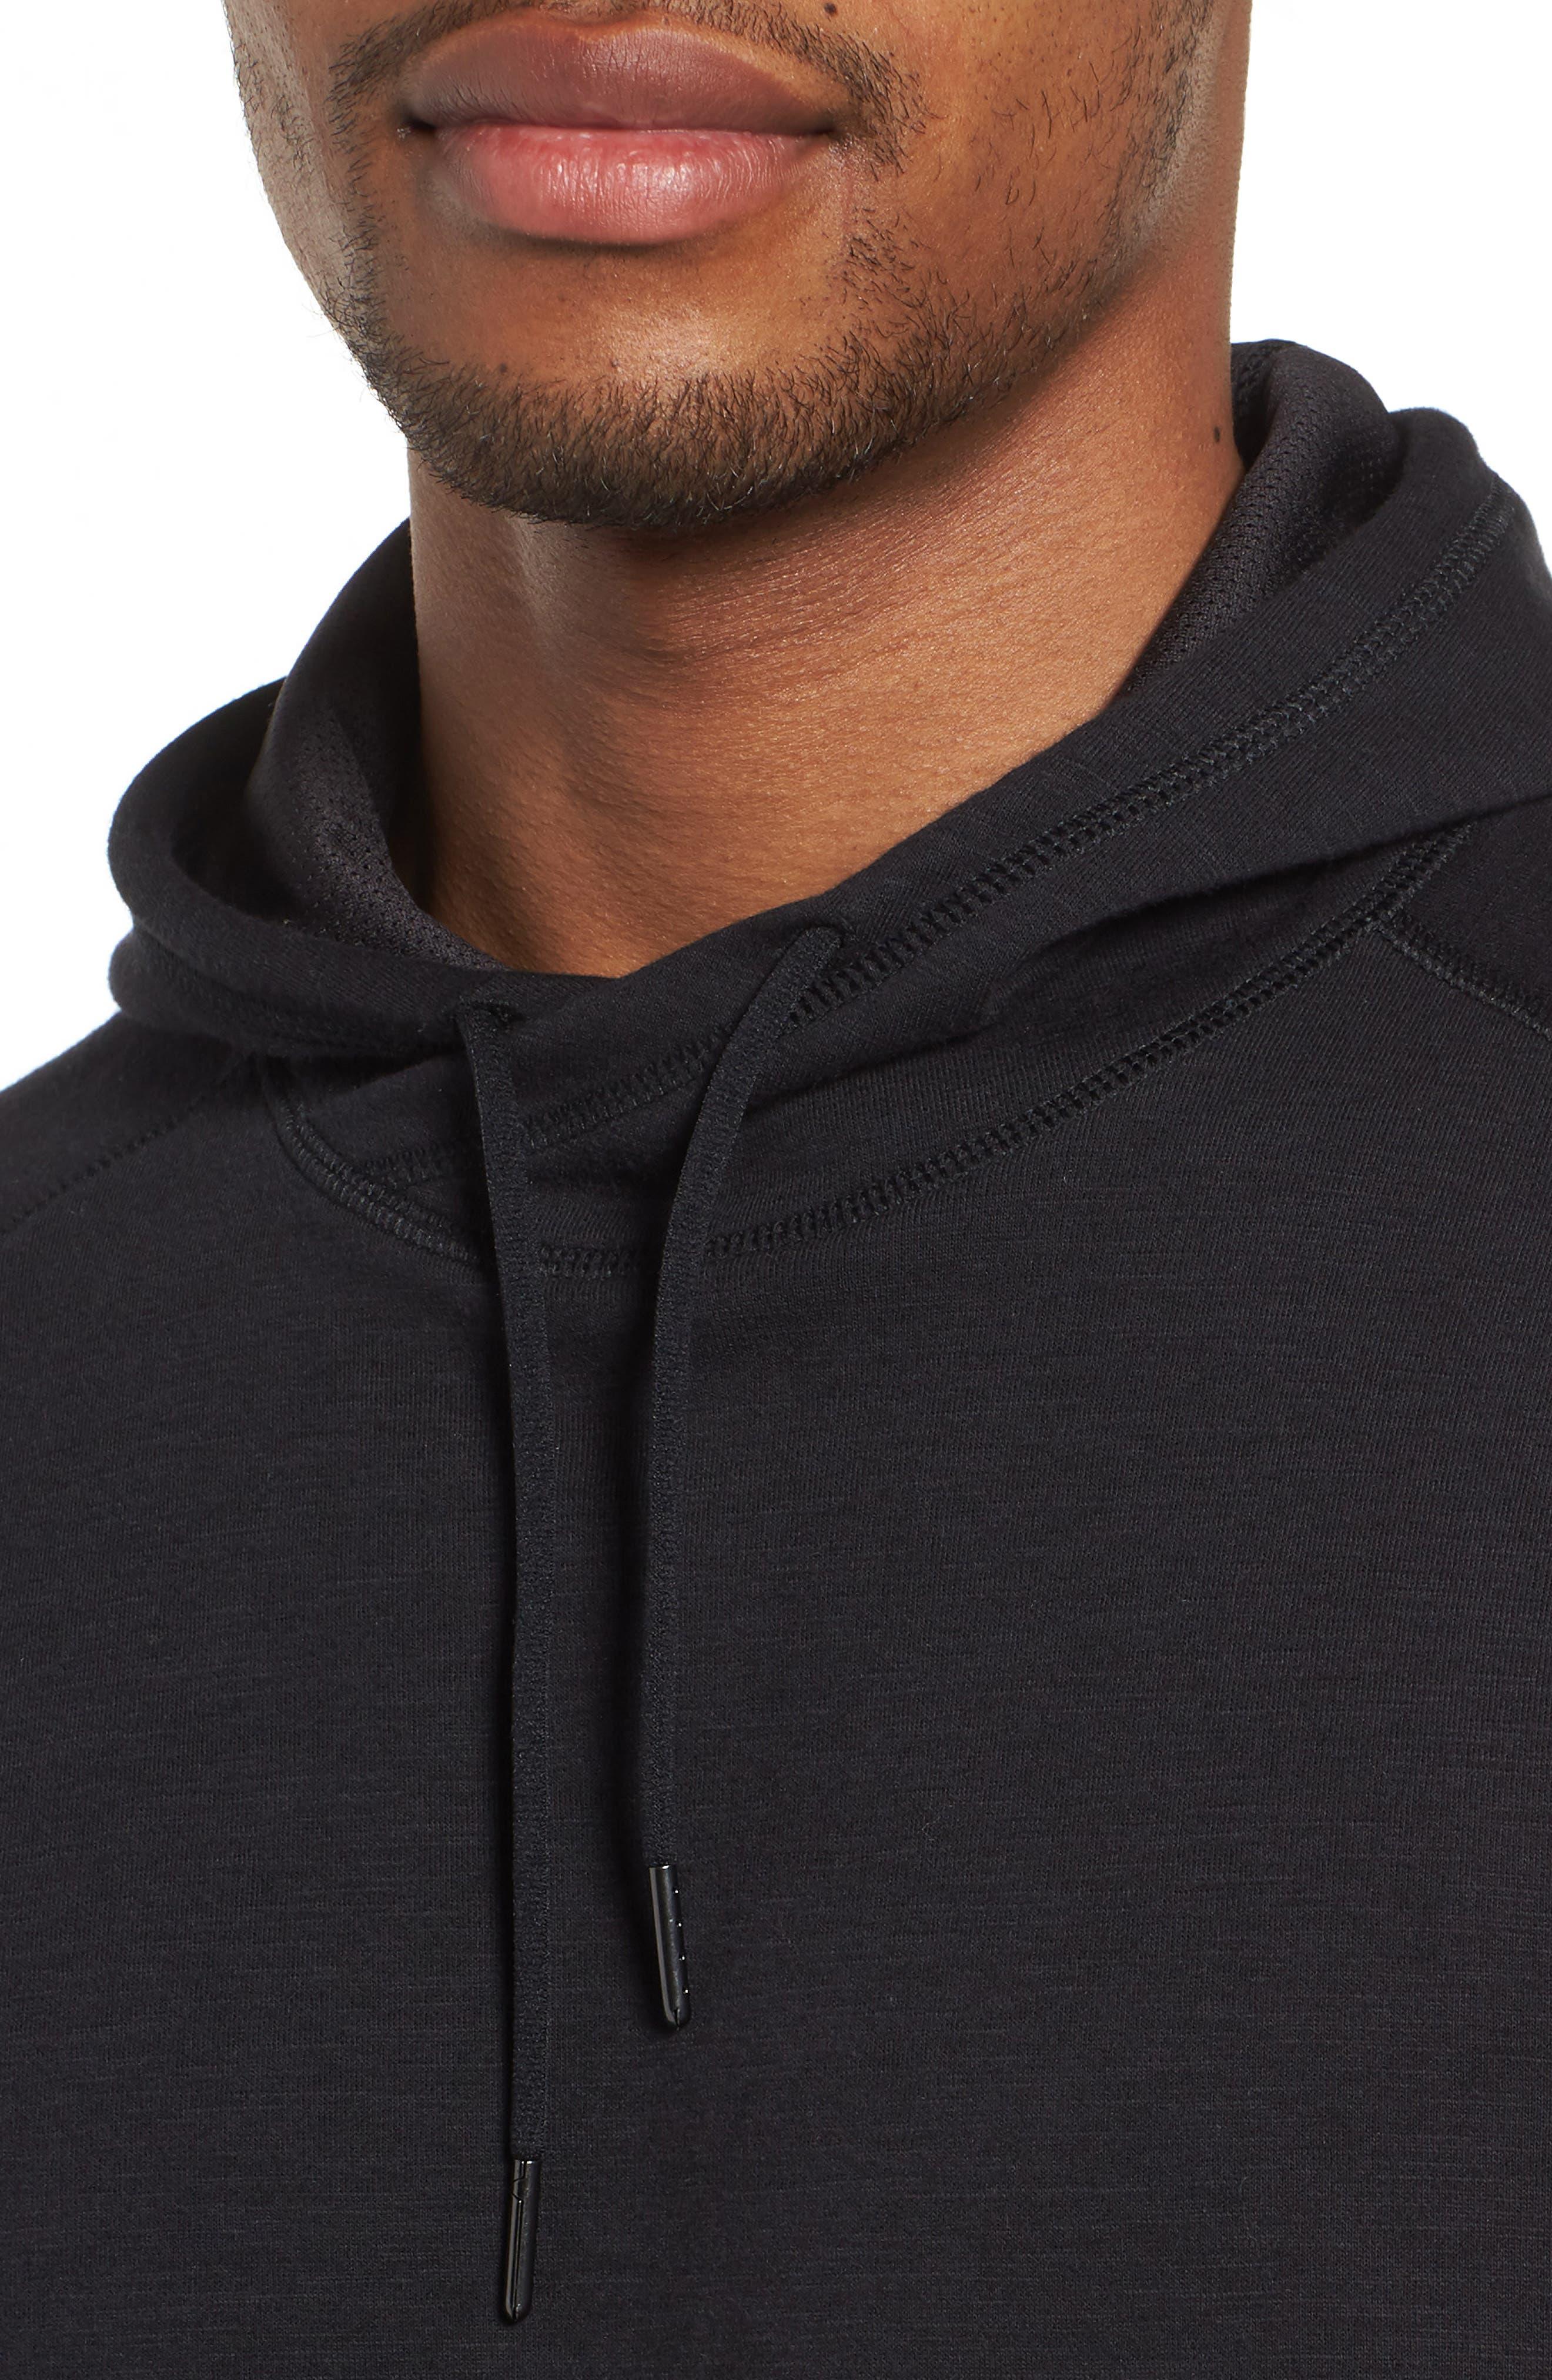 Magnetite Short Sleeve Cotton Blend Hoodie,                             Alternate thumbnail 4, color,                             Black Oxide Melange